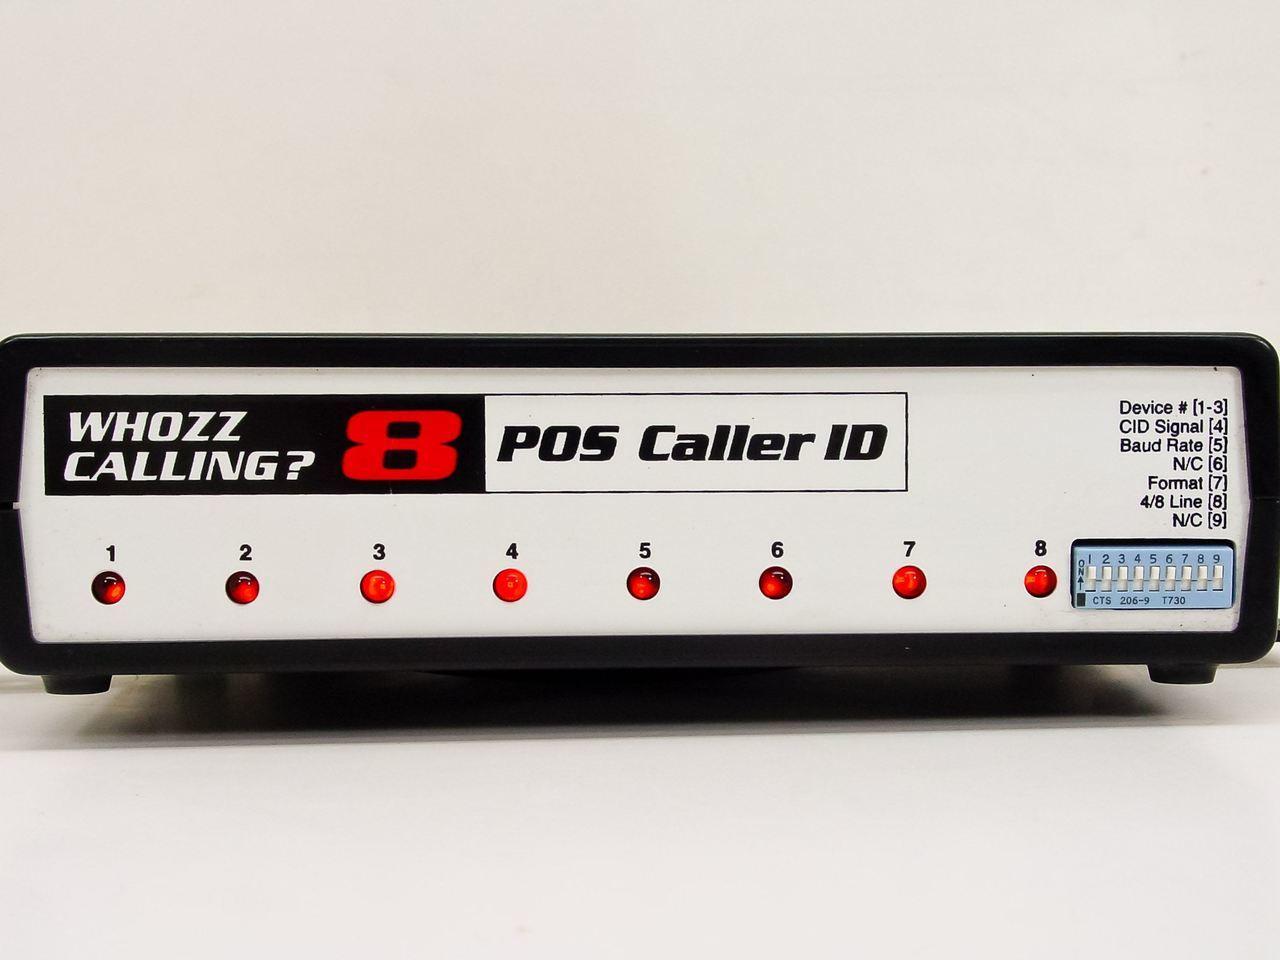 Whozz Caller ID 8 Line Basic & Deluxe